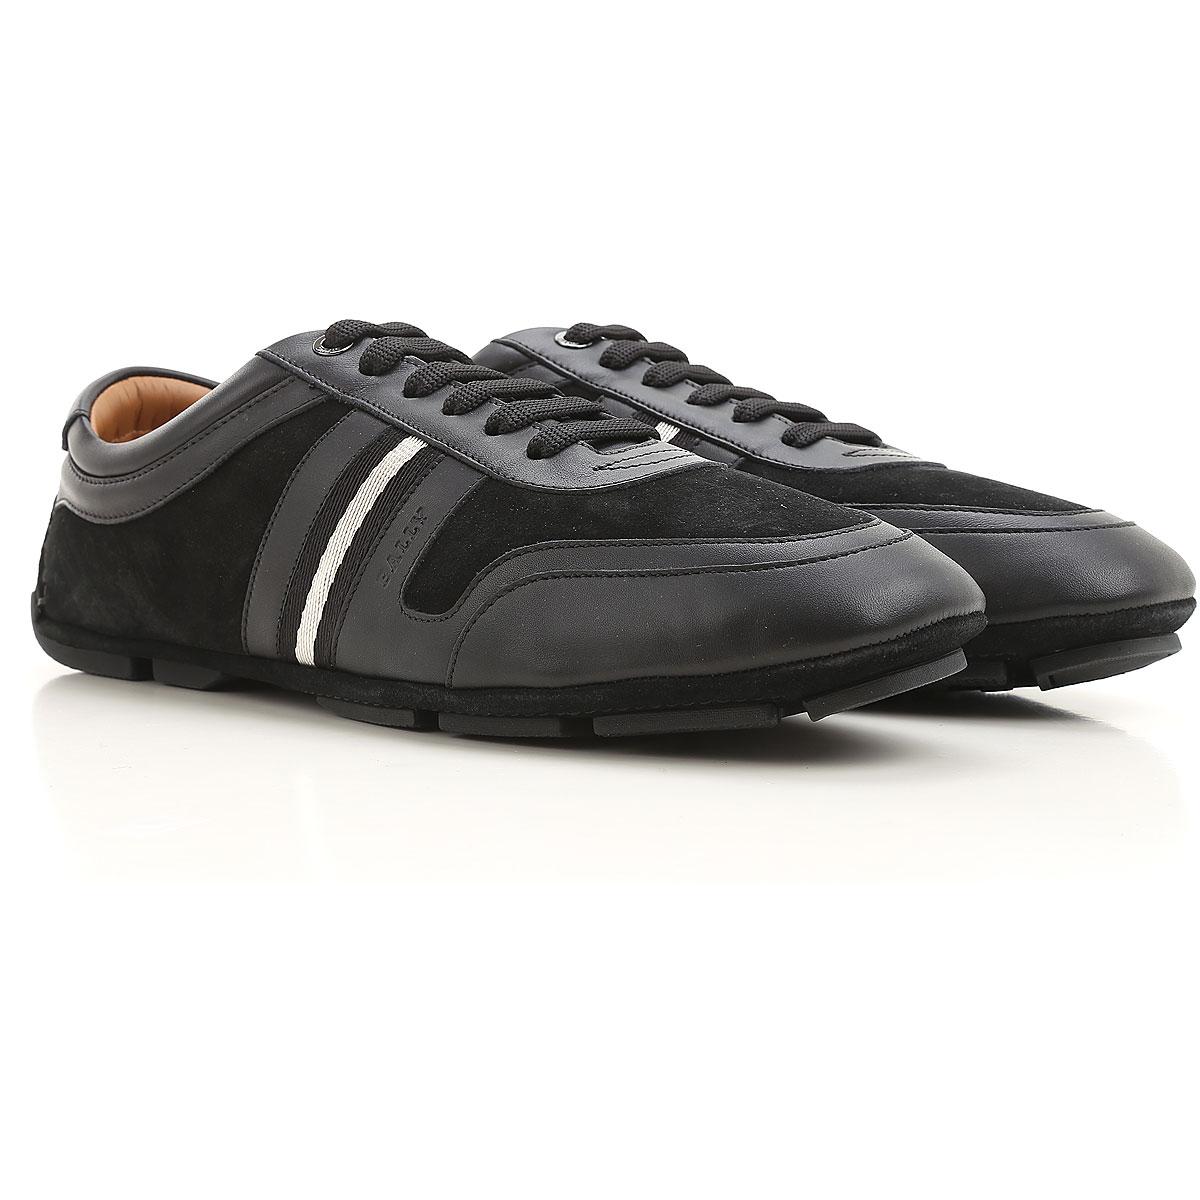 chaussures homme bally code produit 6209848 hunk0 00. Black Bedroom Furniture Sets. Home Design Ideas